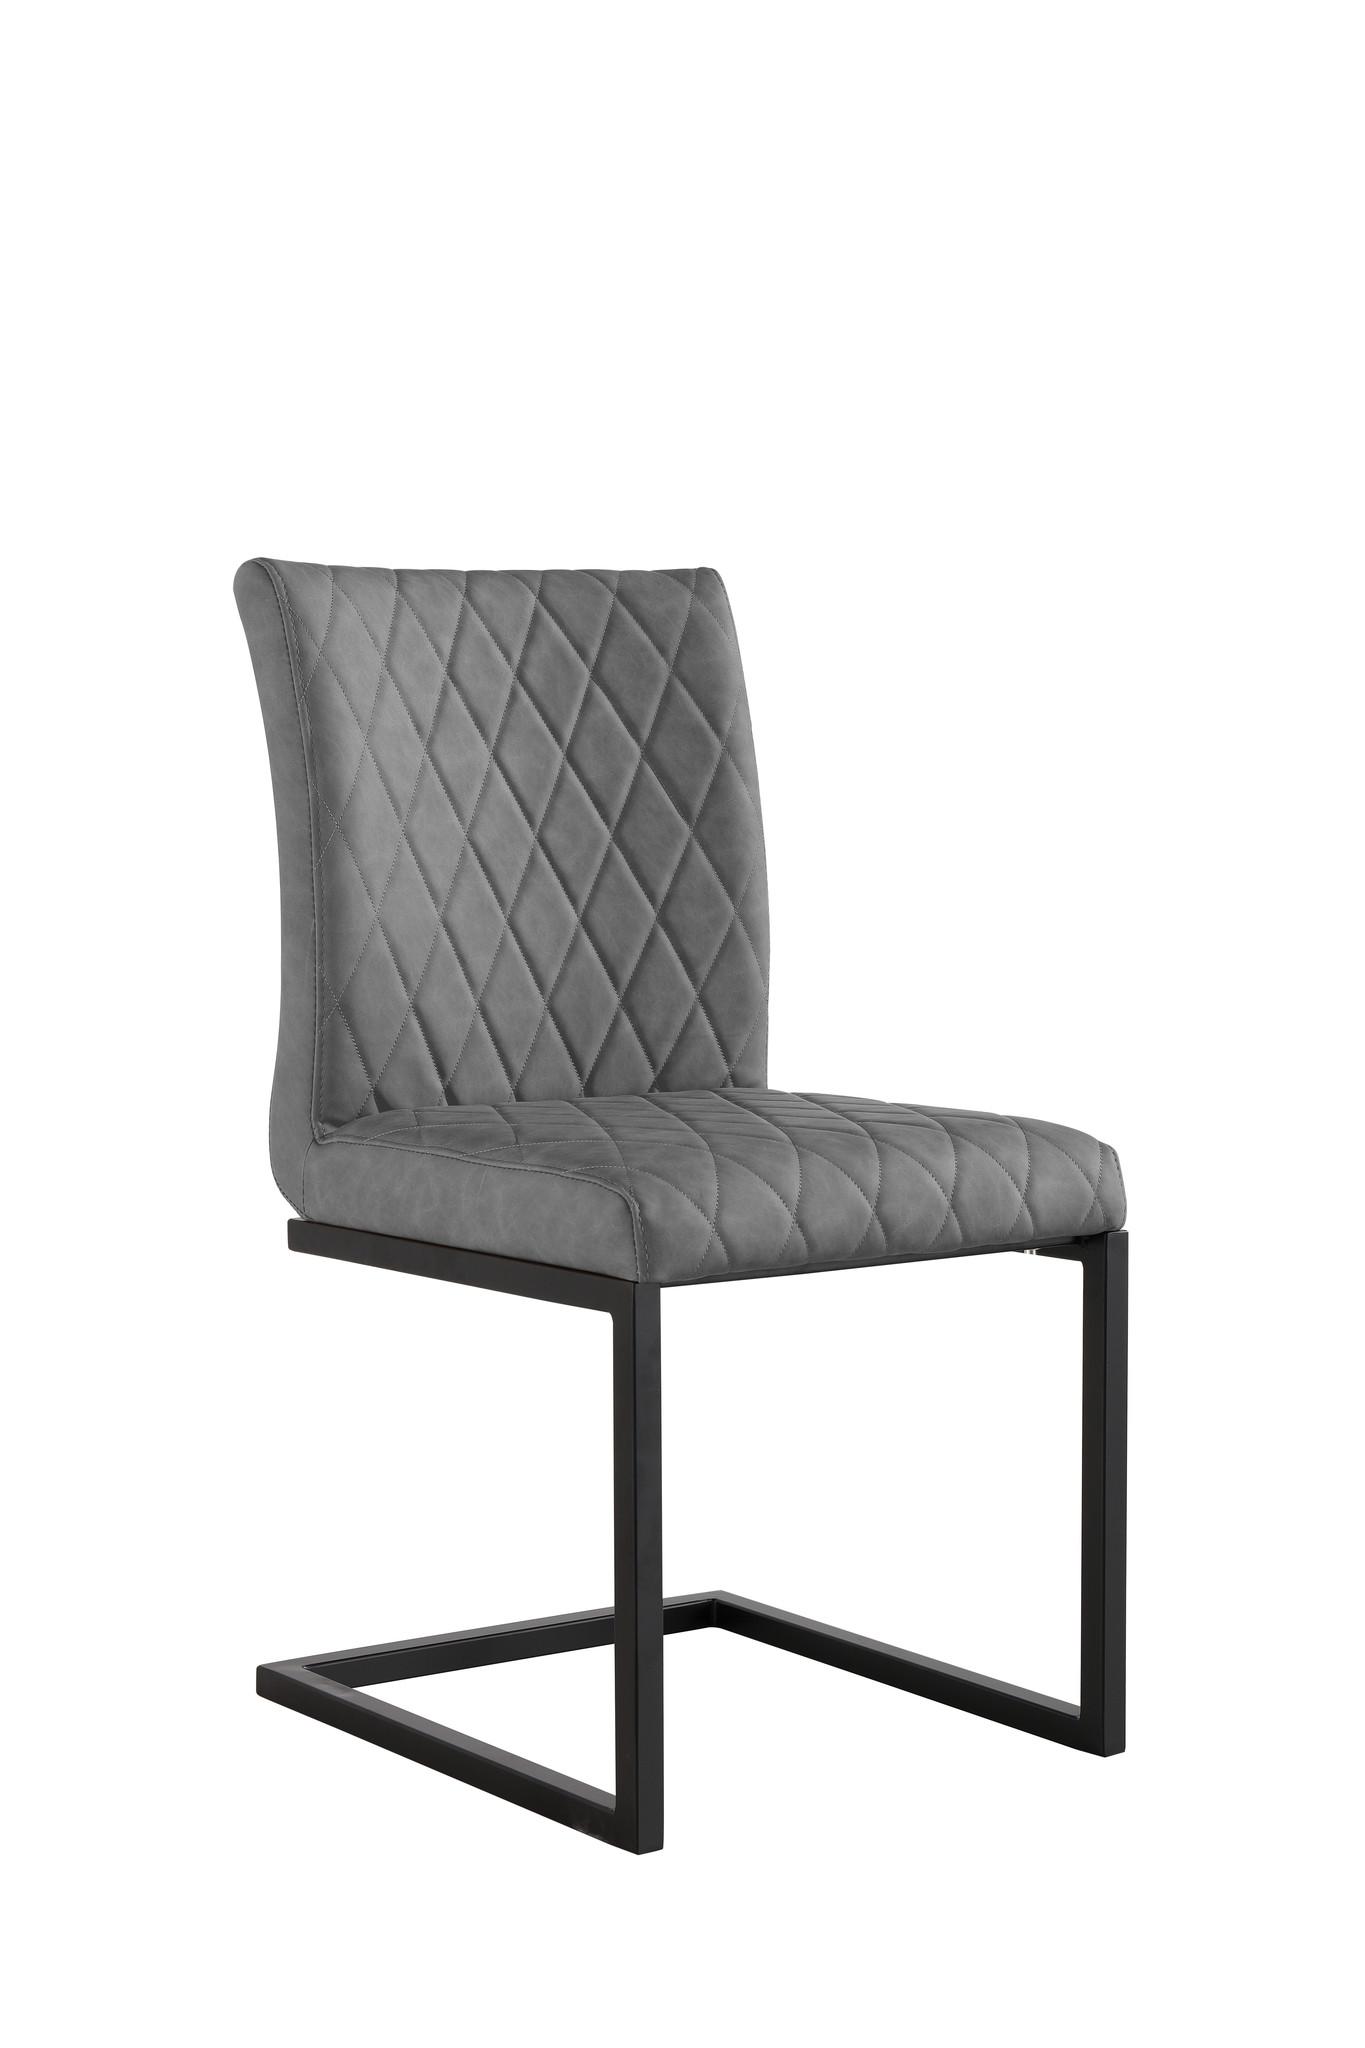 Diamond Stitch Dining Chair - Grey PU - Pair